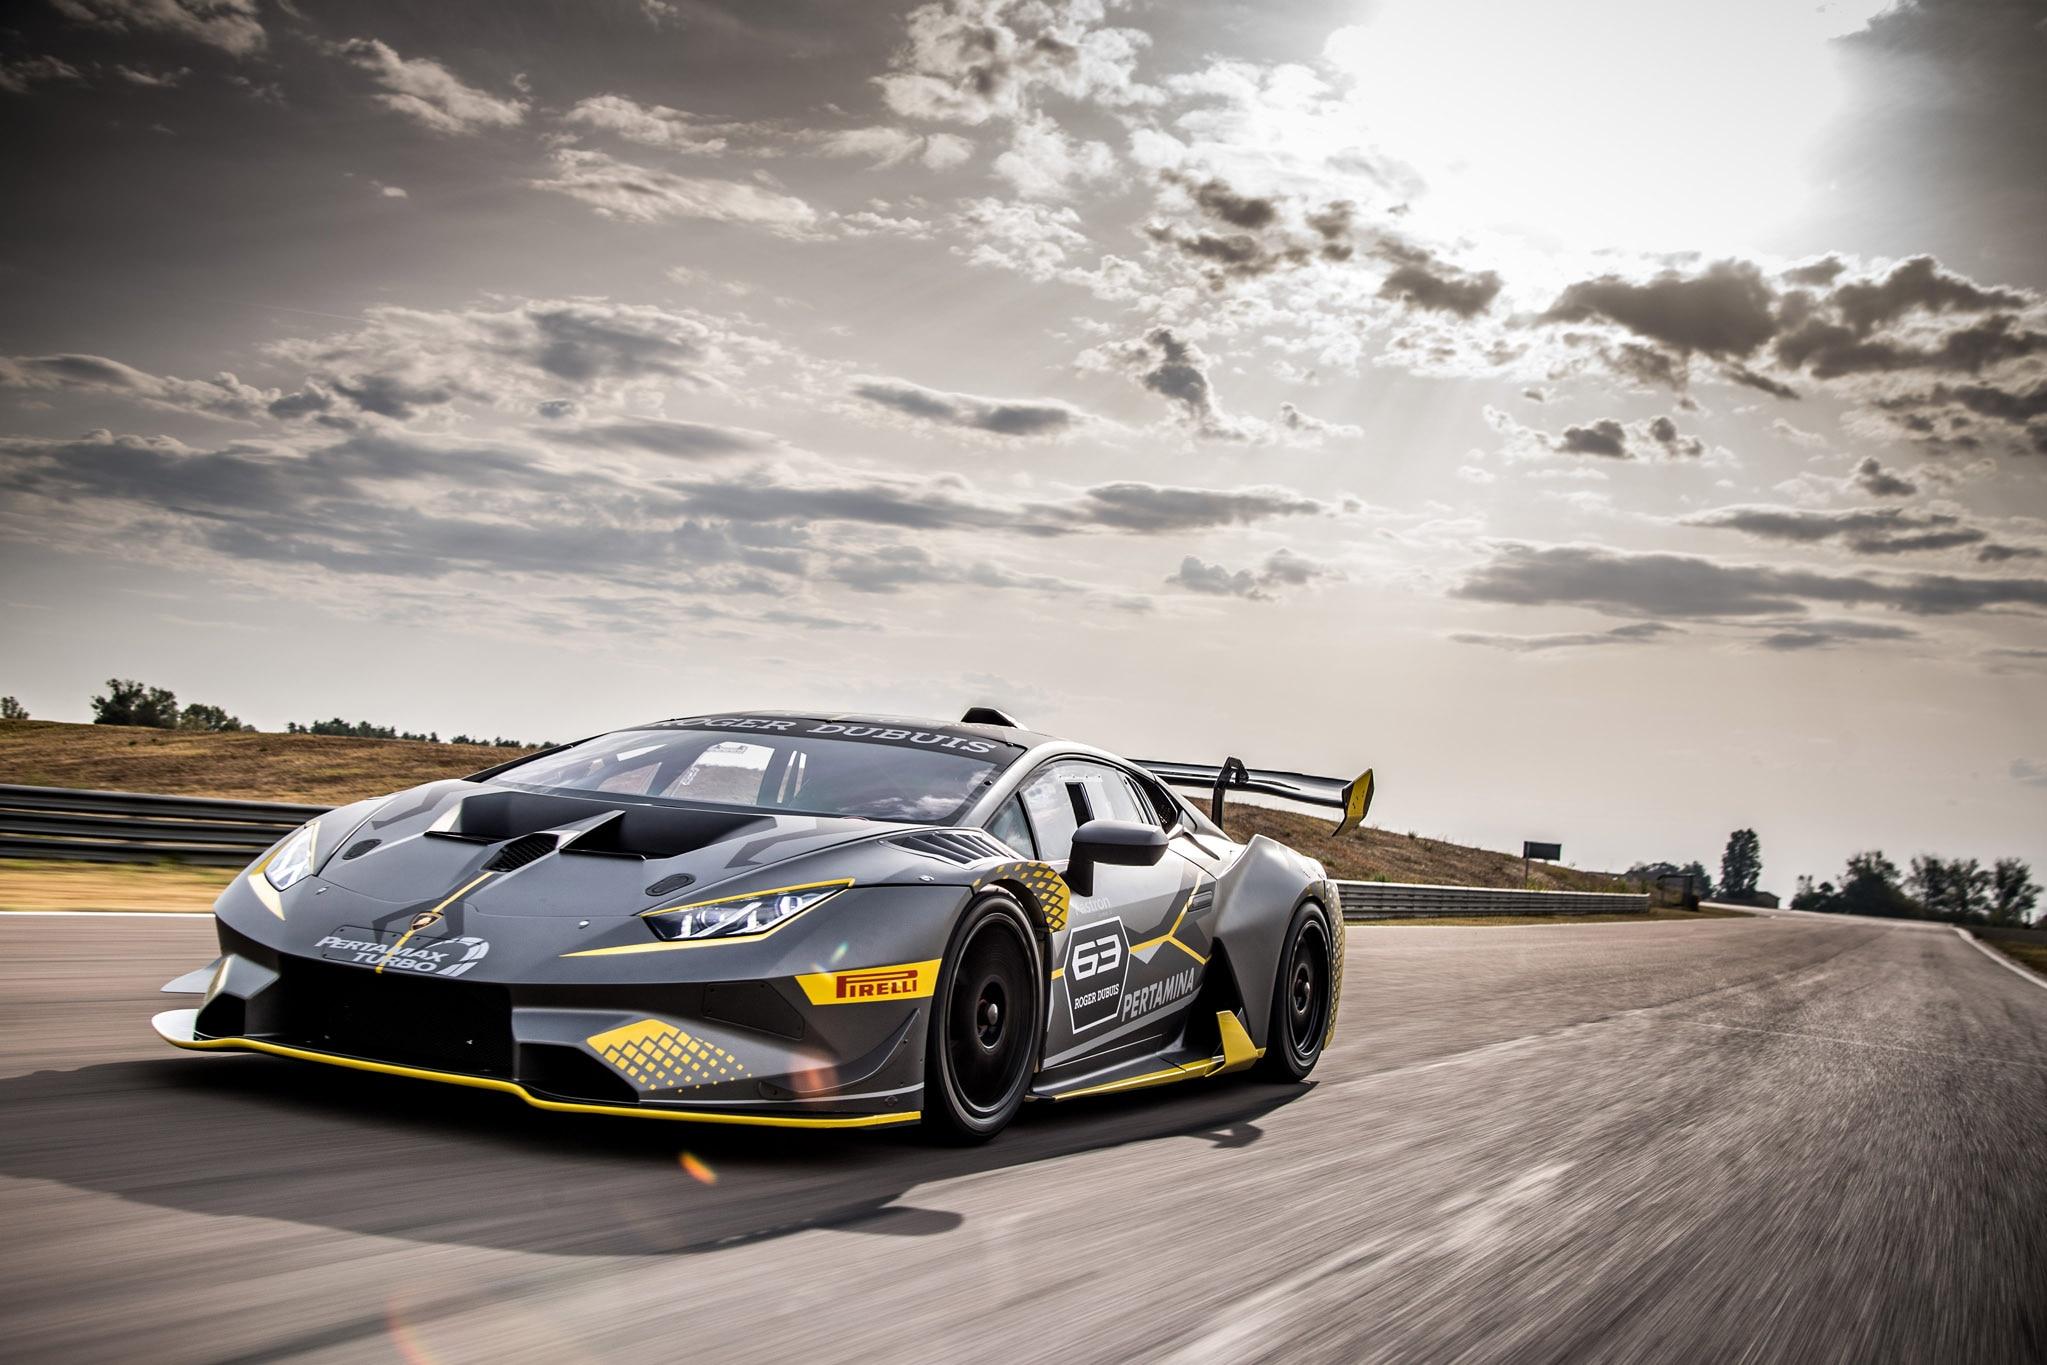 Lamborghini Huracán Super Trofeo EVO wants a piece of you